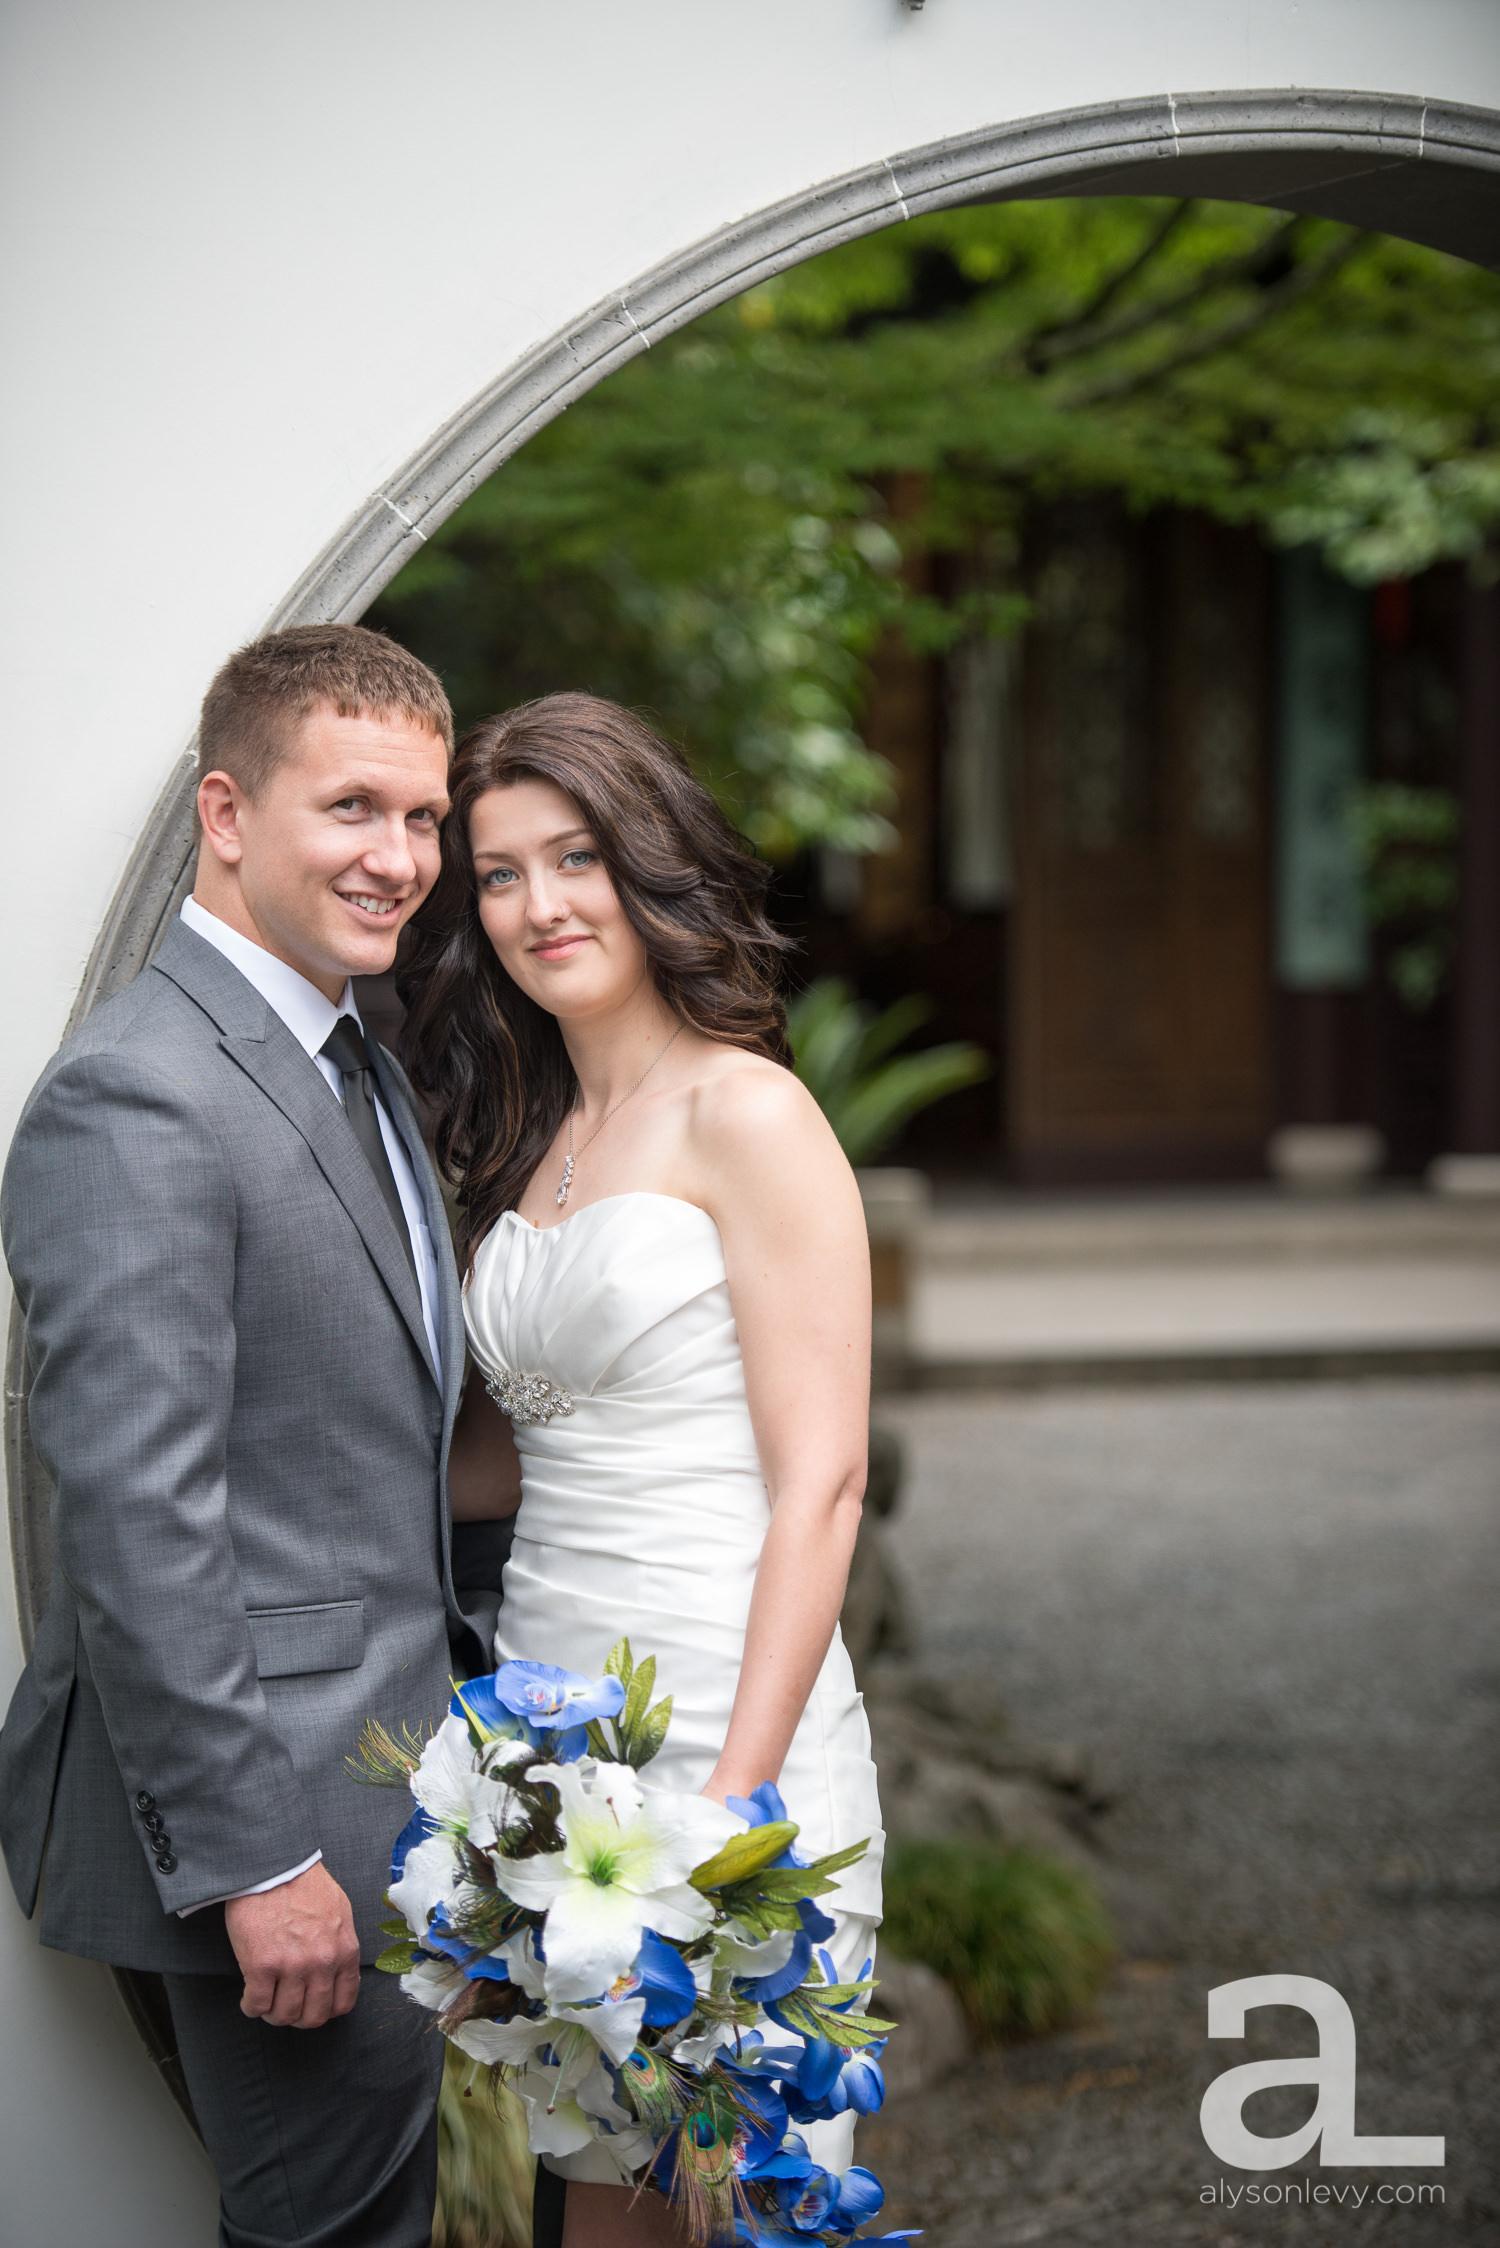 LanSu-Chinese-Garden-Portland-Wedding-Photography-008.jpg